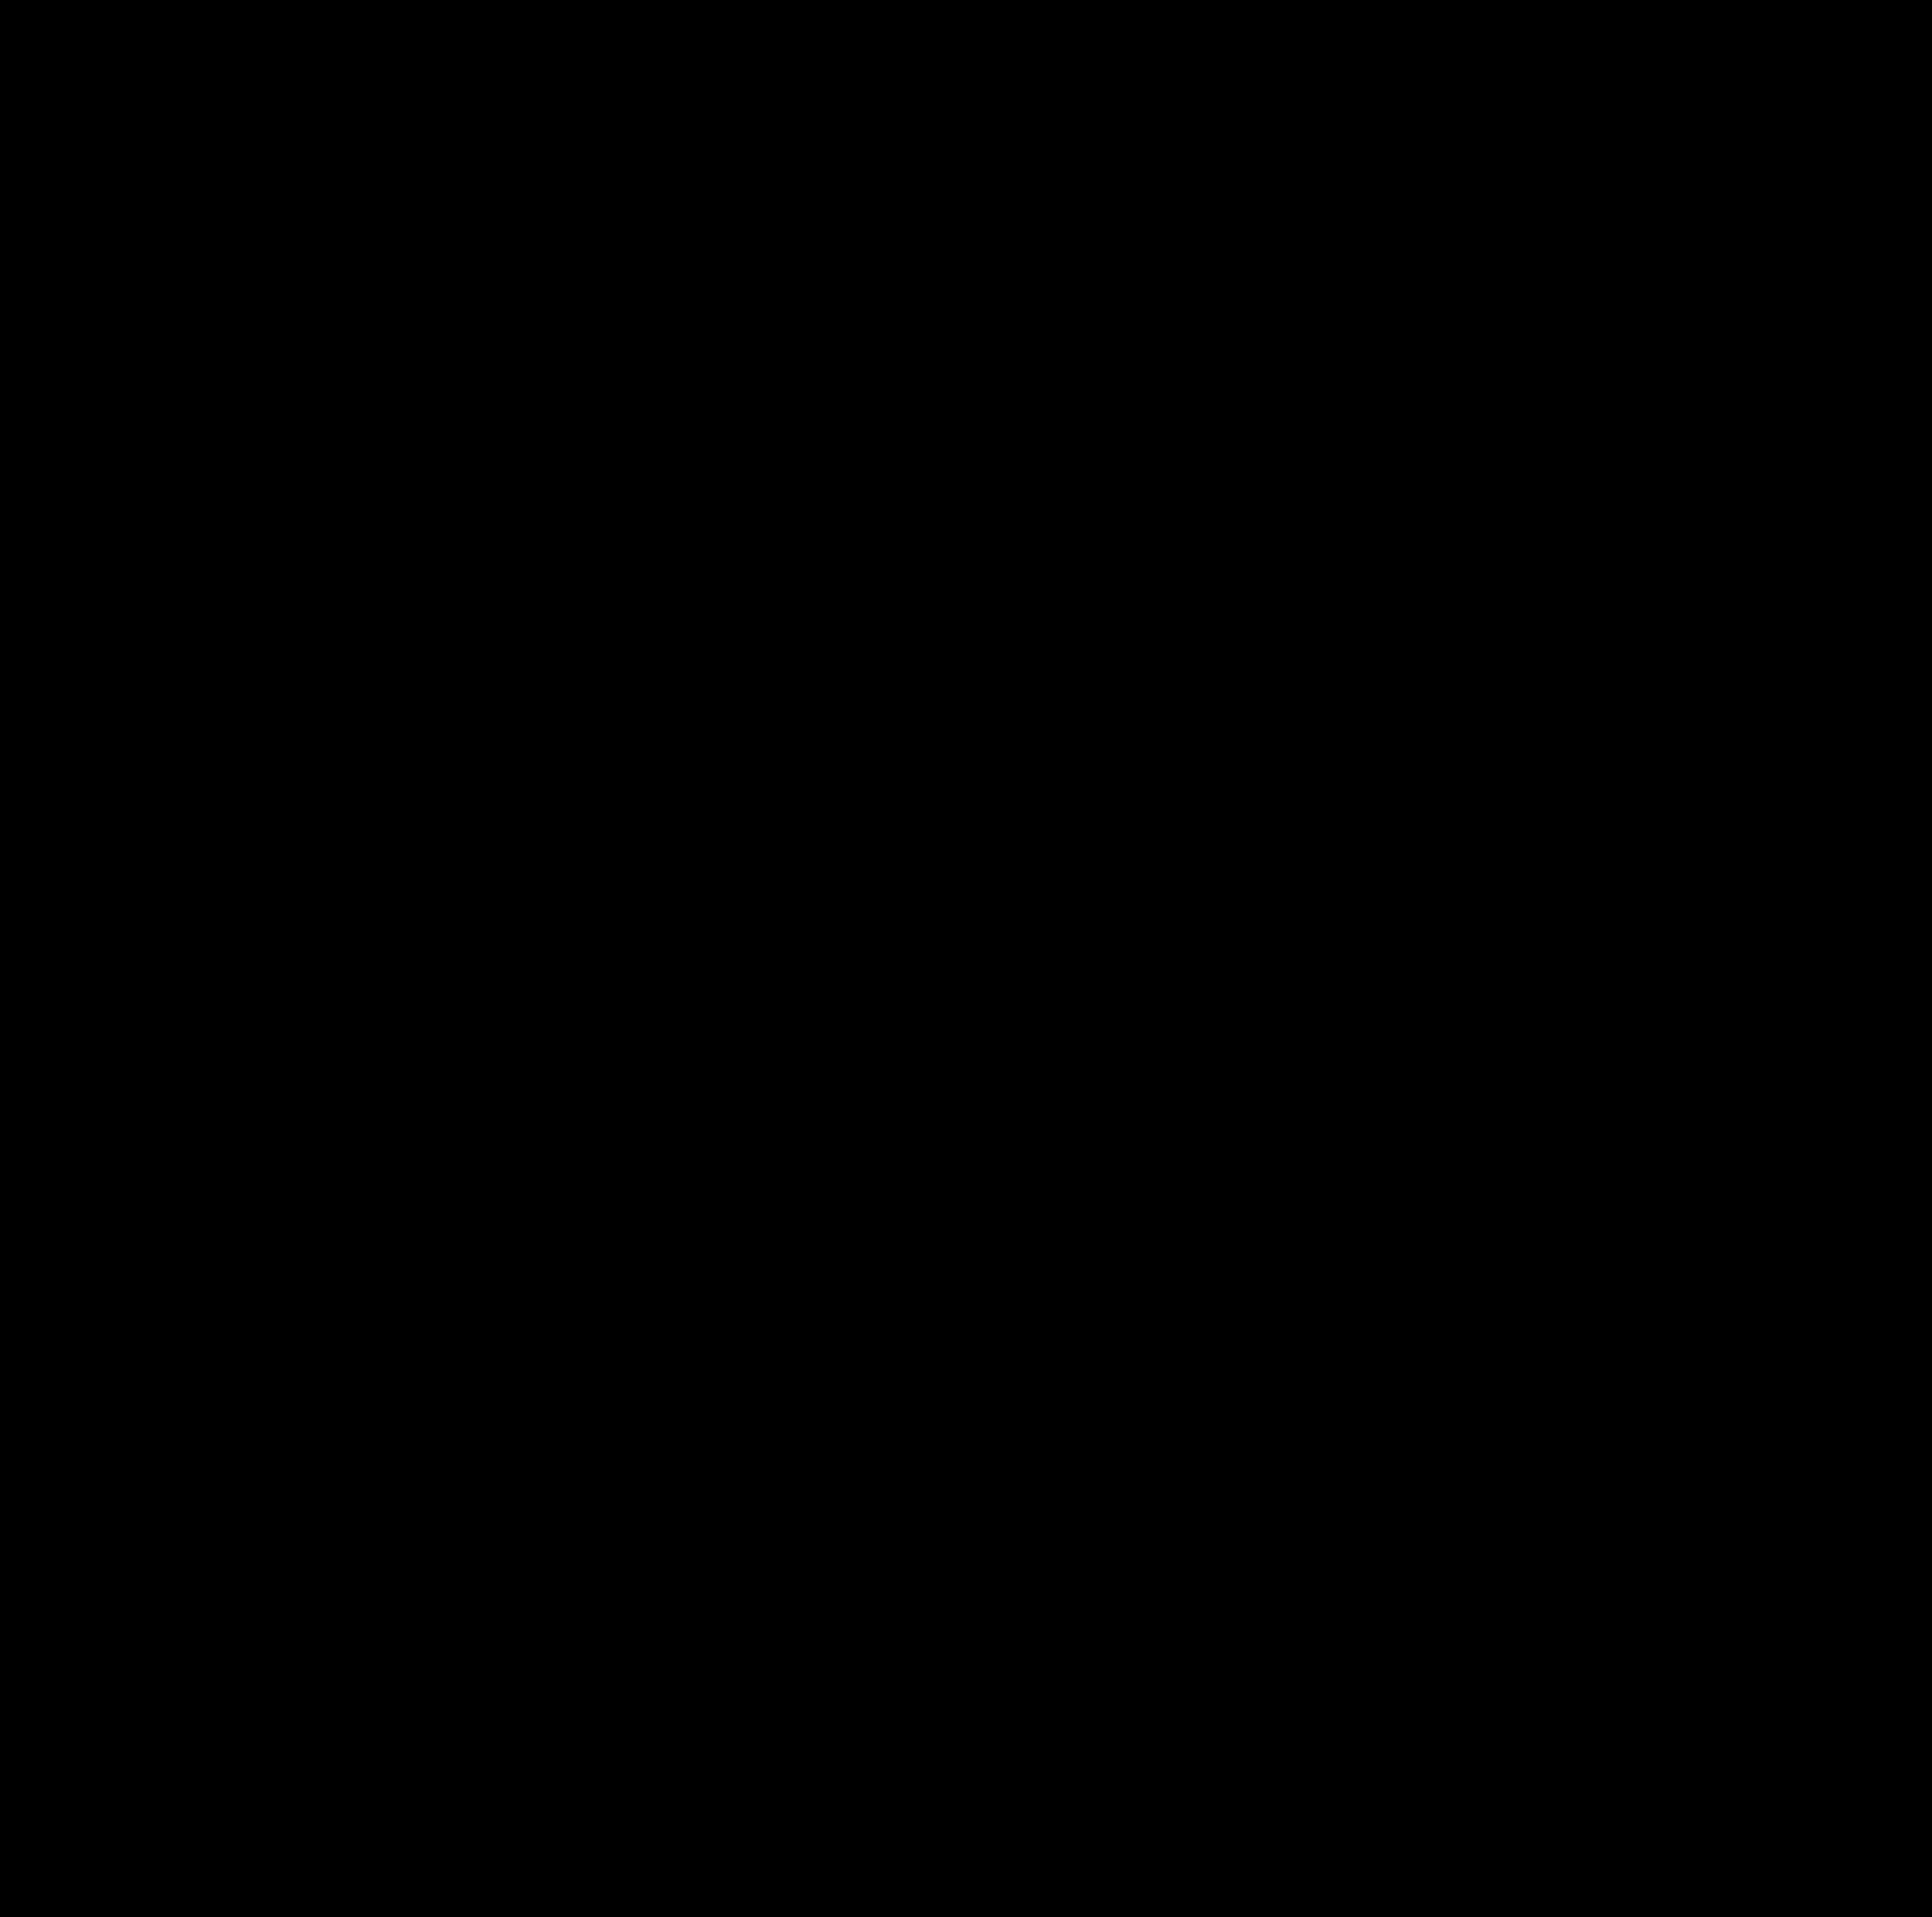 Skjærgårdstjenesten på Hvaler